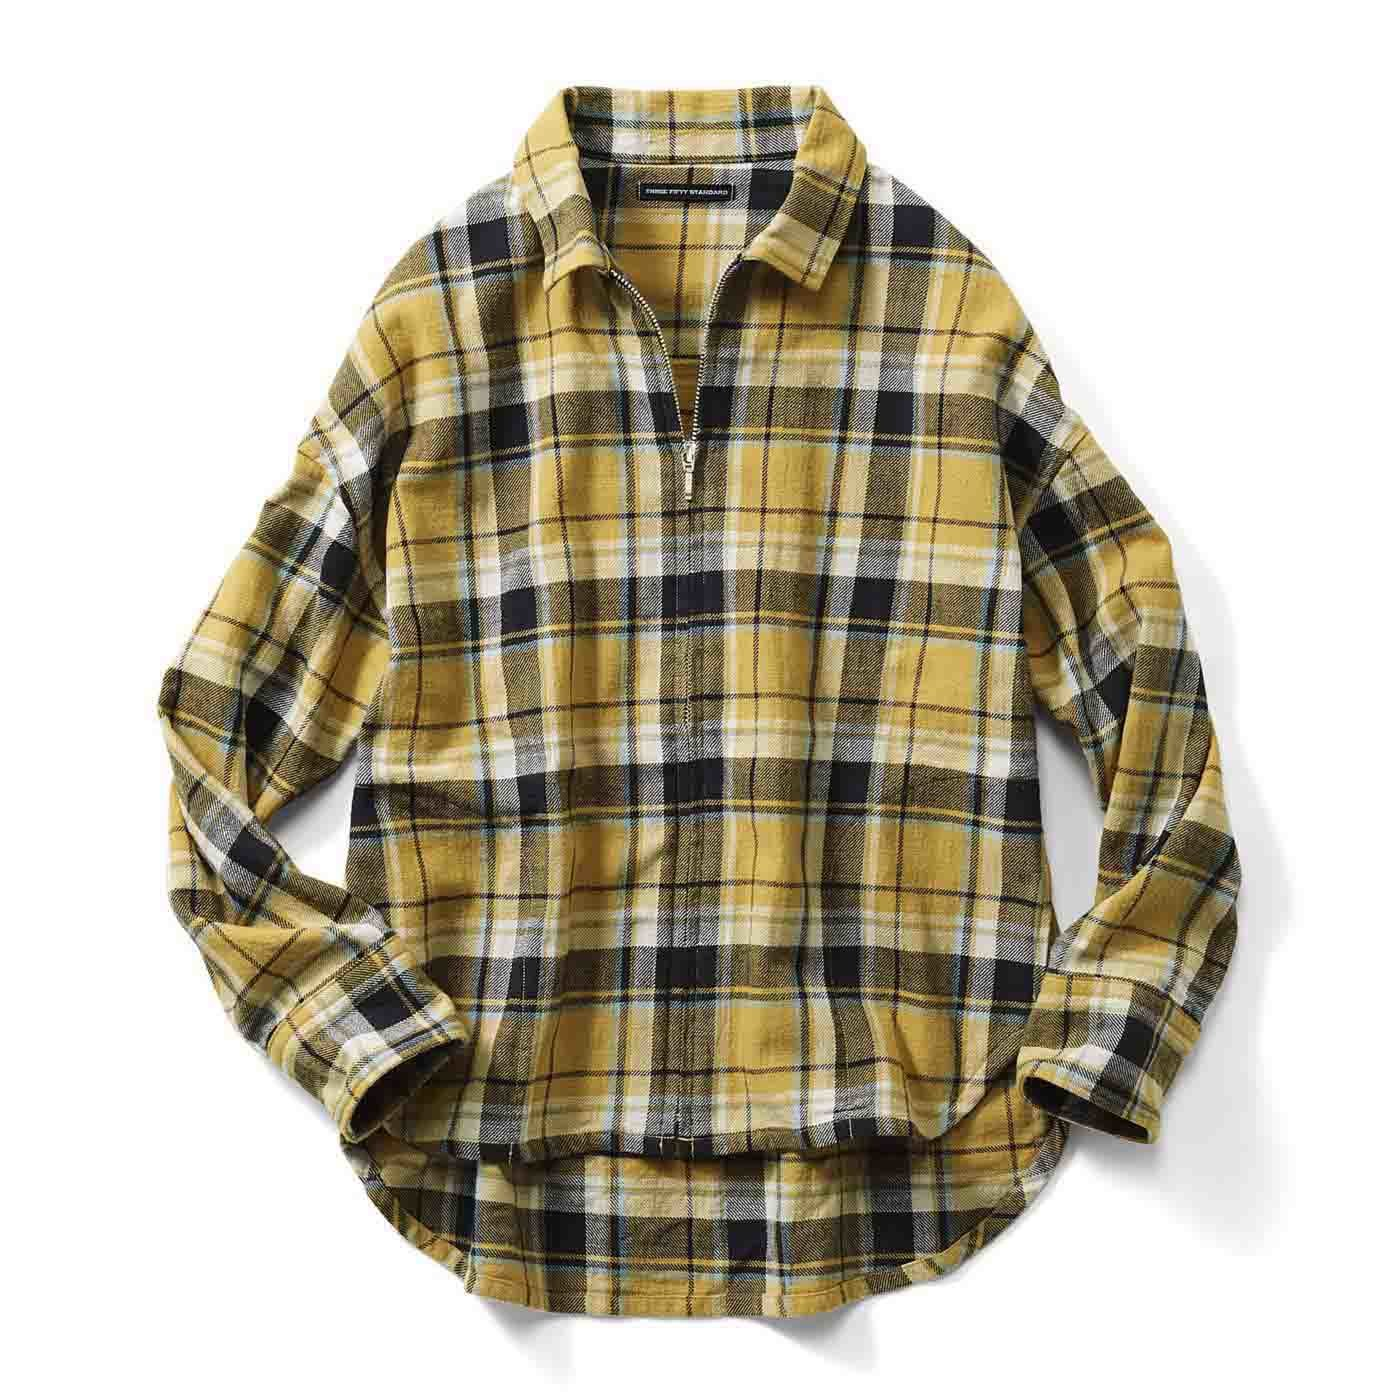 THREE FIFTY STANDARD 古着みたいなチェックのジップアップシャツジャケット